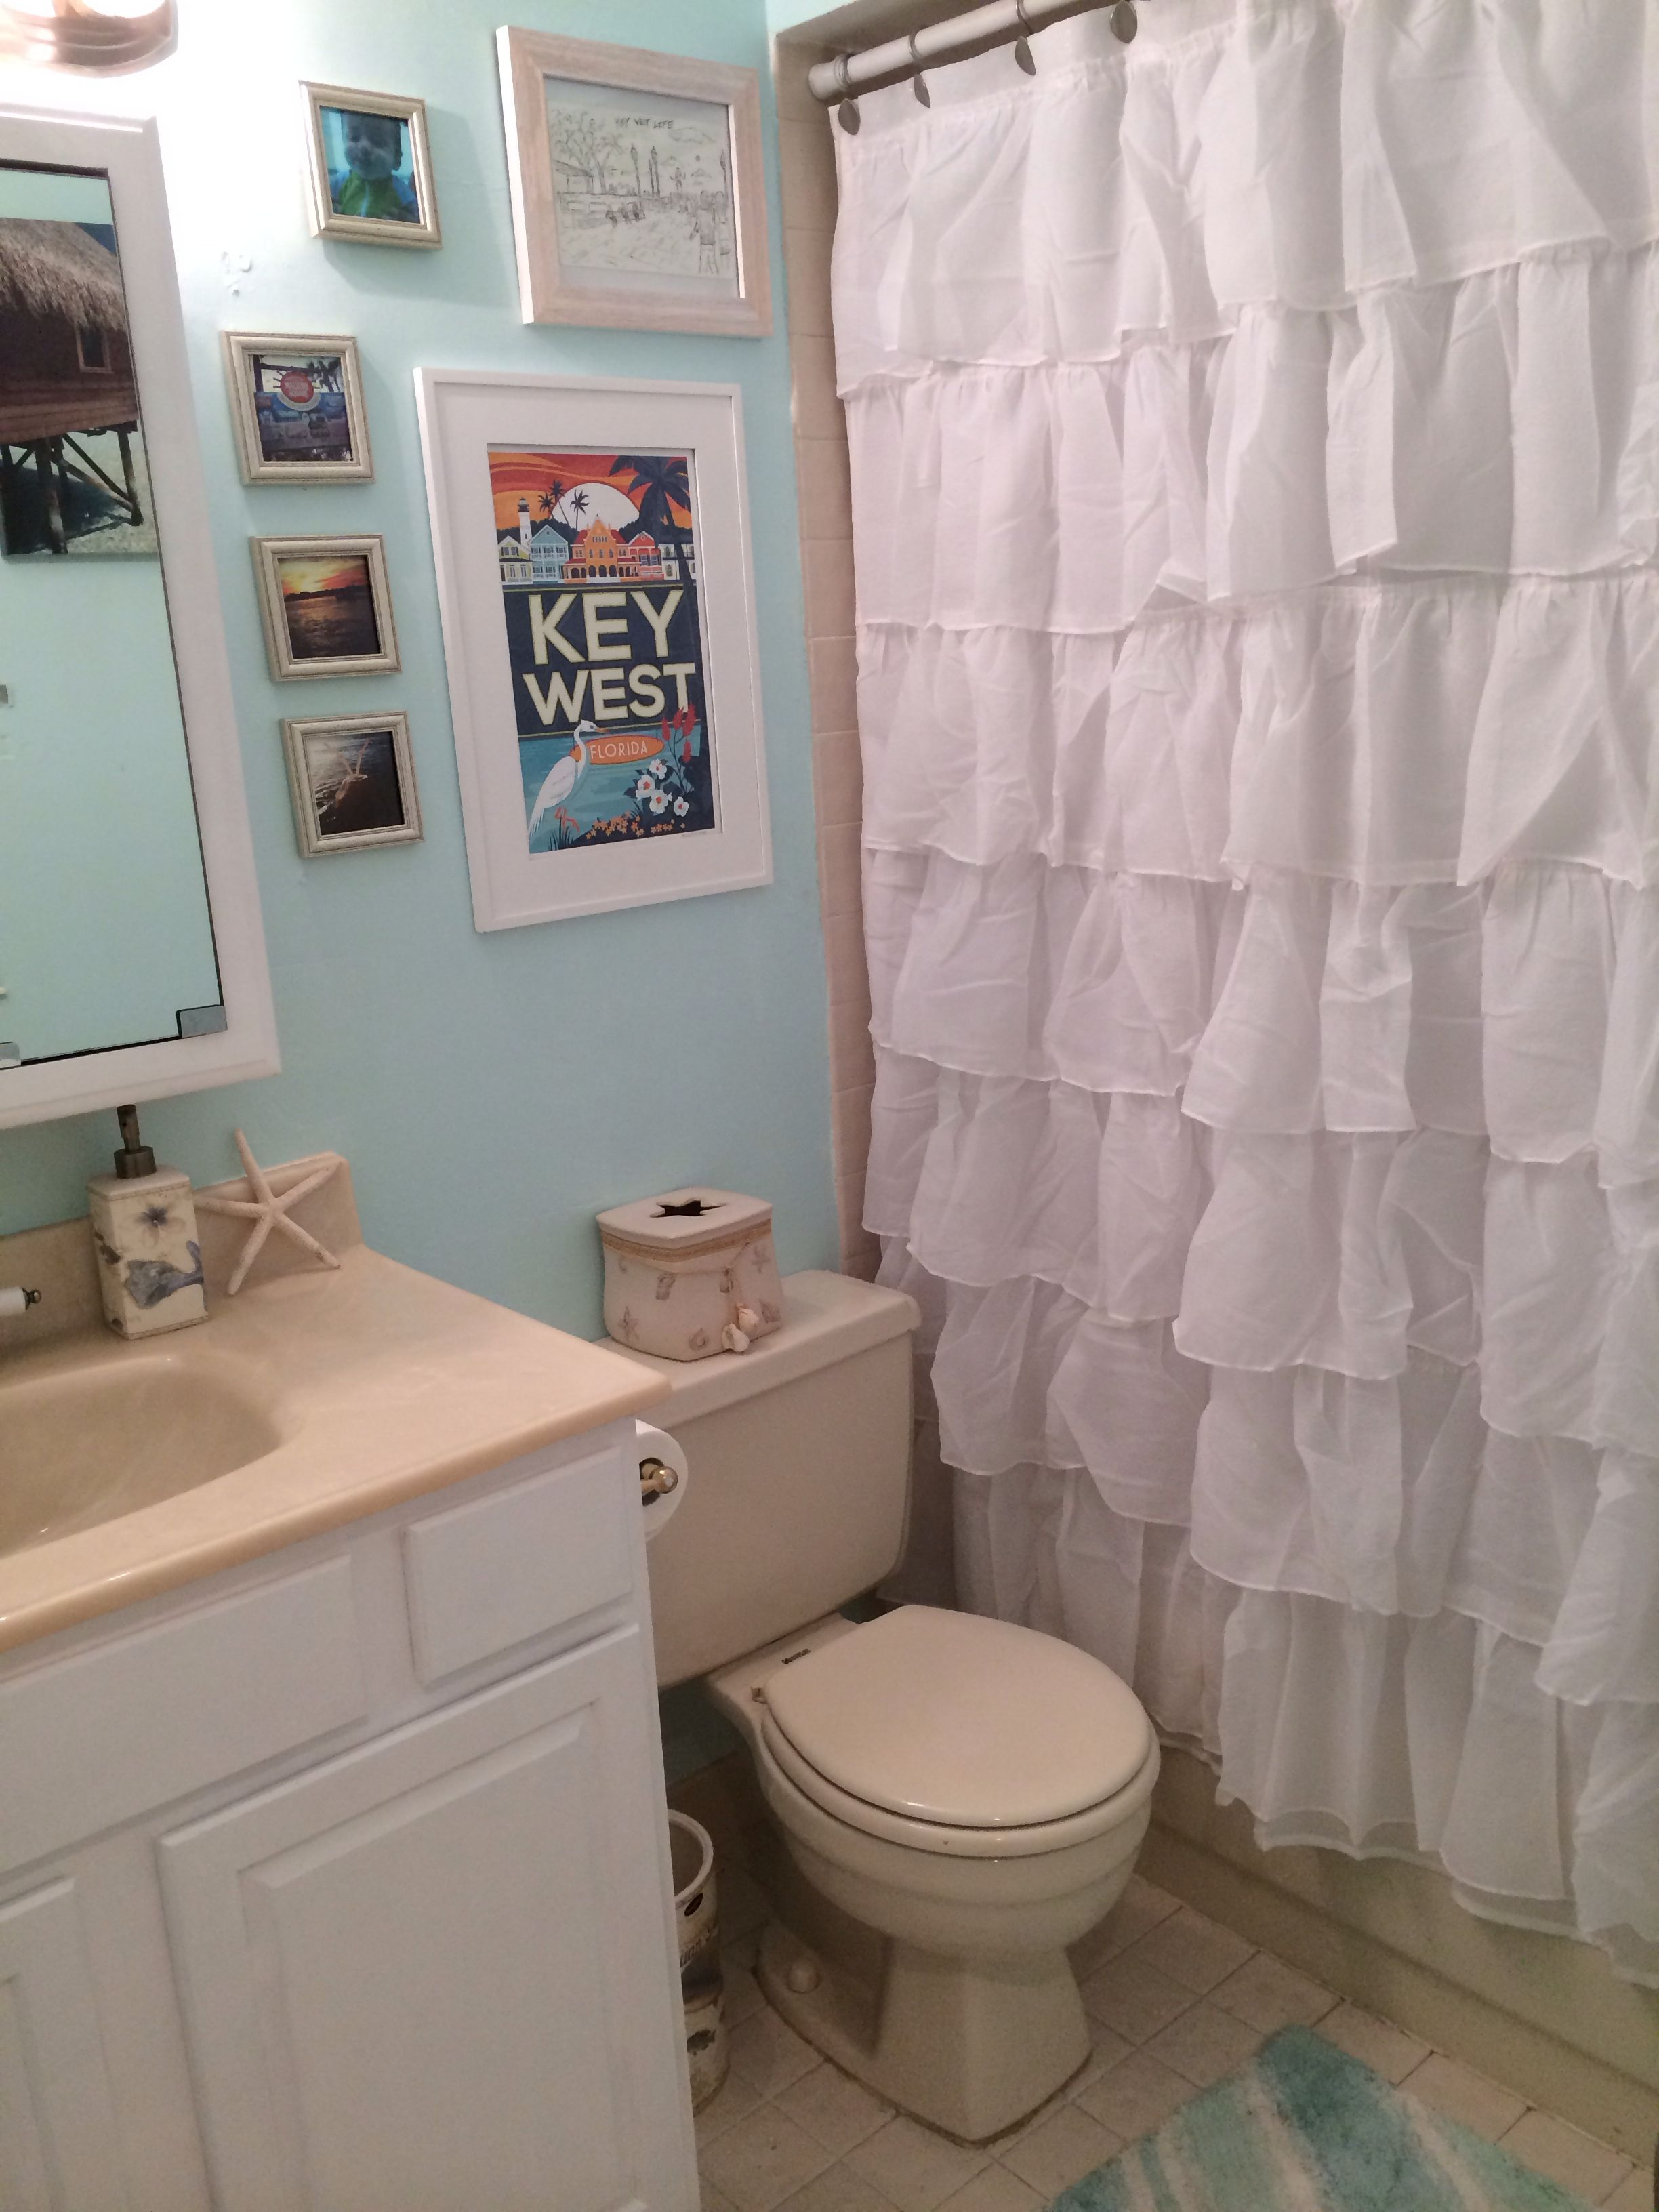 Key West style bathroom :) Key west style ideas Pinterest #80604B 3264x2448 Acessorios Banheiro Kelly